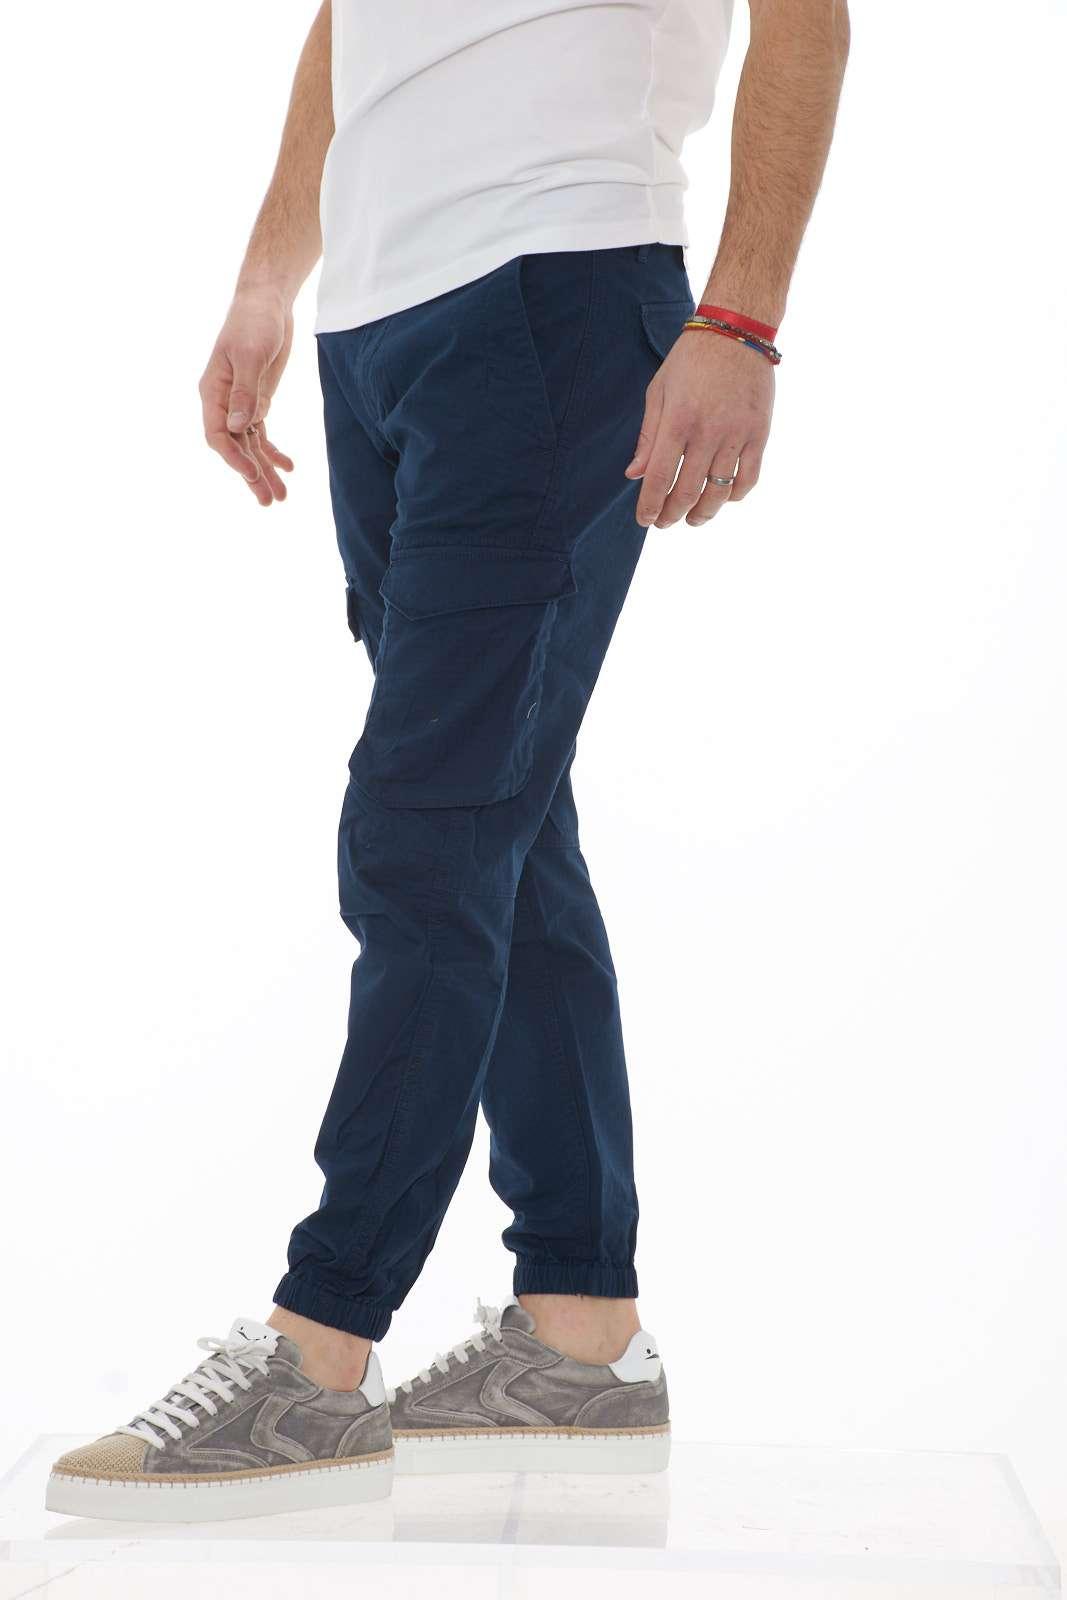 https://www.parmax.com/media/catalog/product/a/i/PE-outlet_parmax-pantaloni-uomo-Timberland-TB%200A1OBC-B.jpg